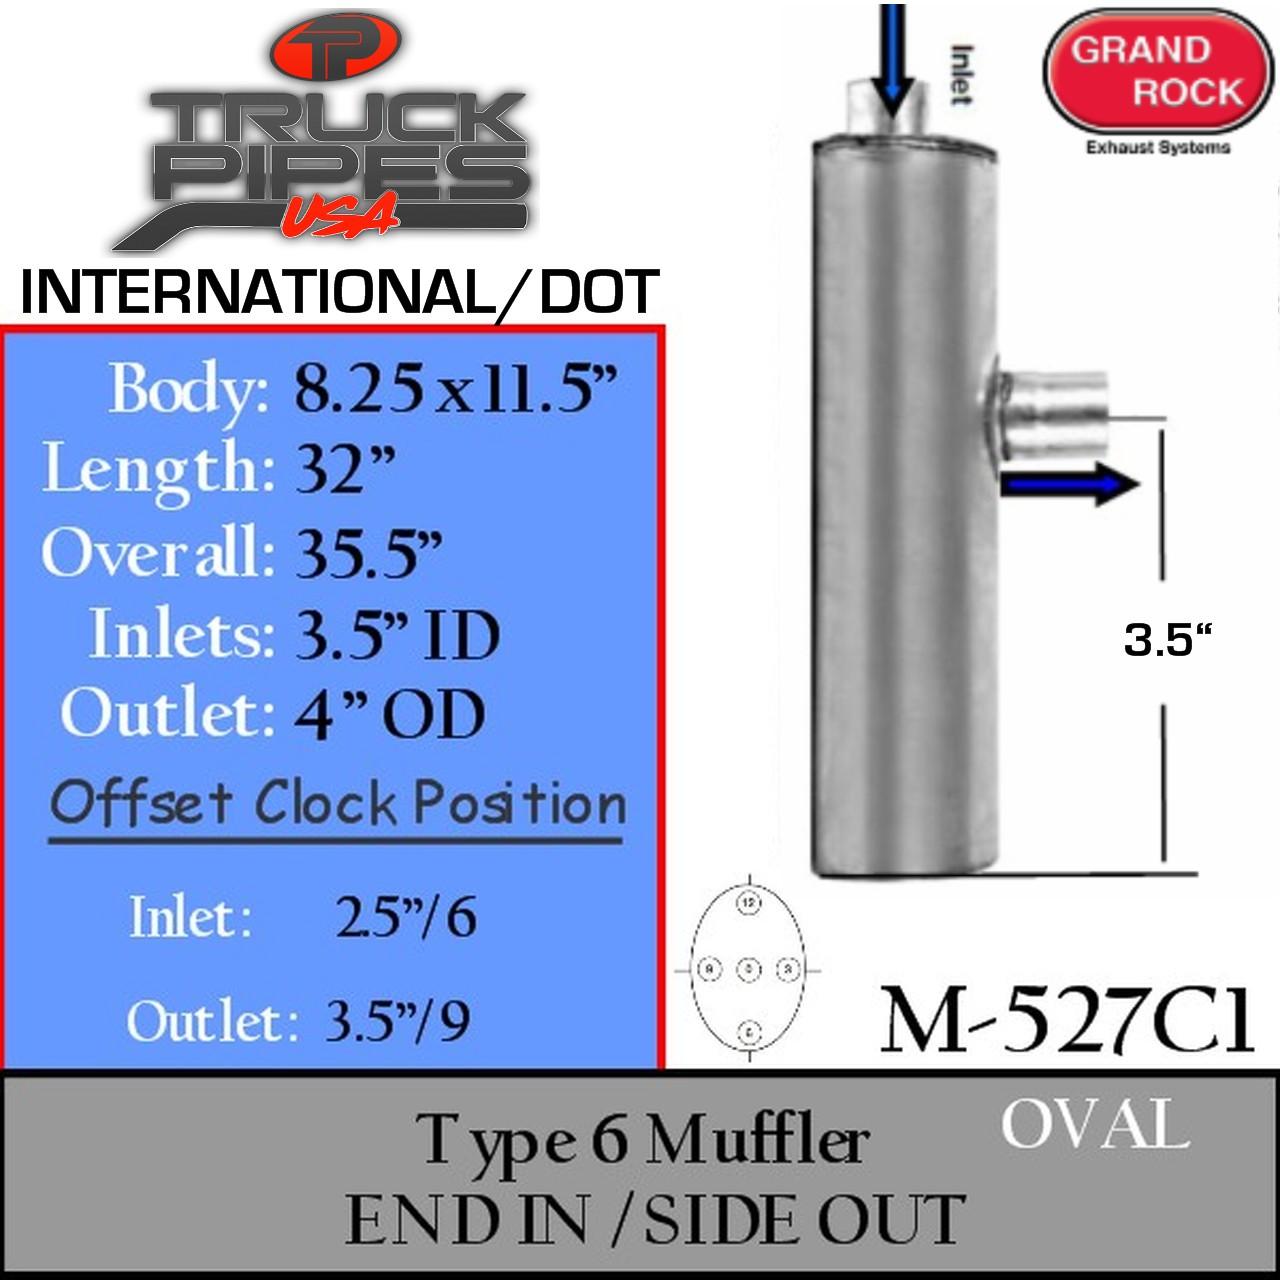 m-527c1-international-dot-truck-muffler-or-oval-diesel-big-rig-muffler-type6-end-in-side-out-pipe.jpg